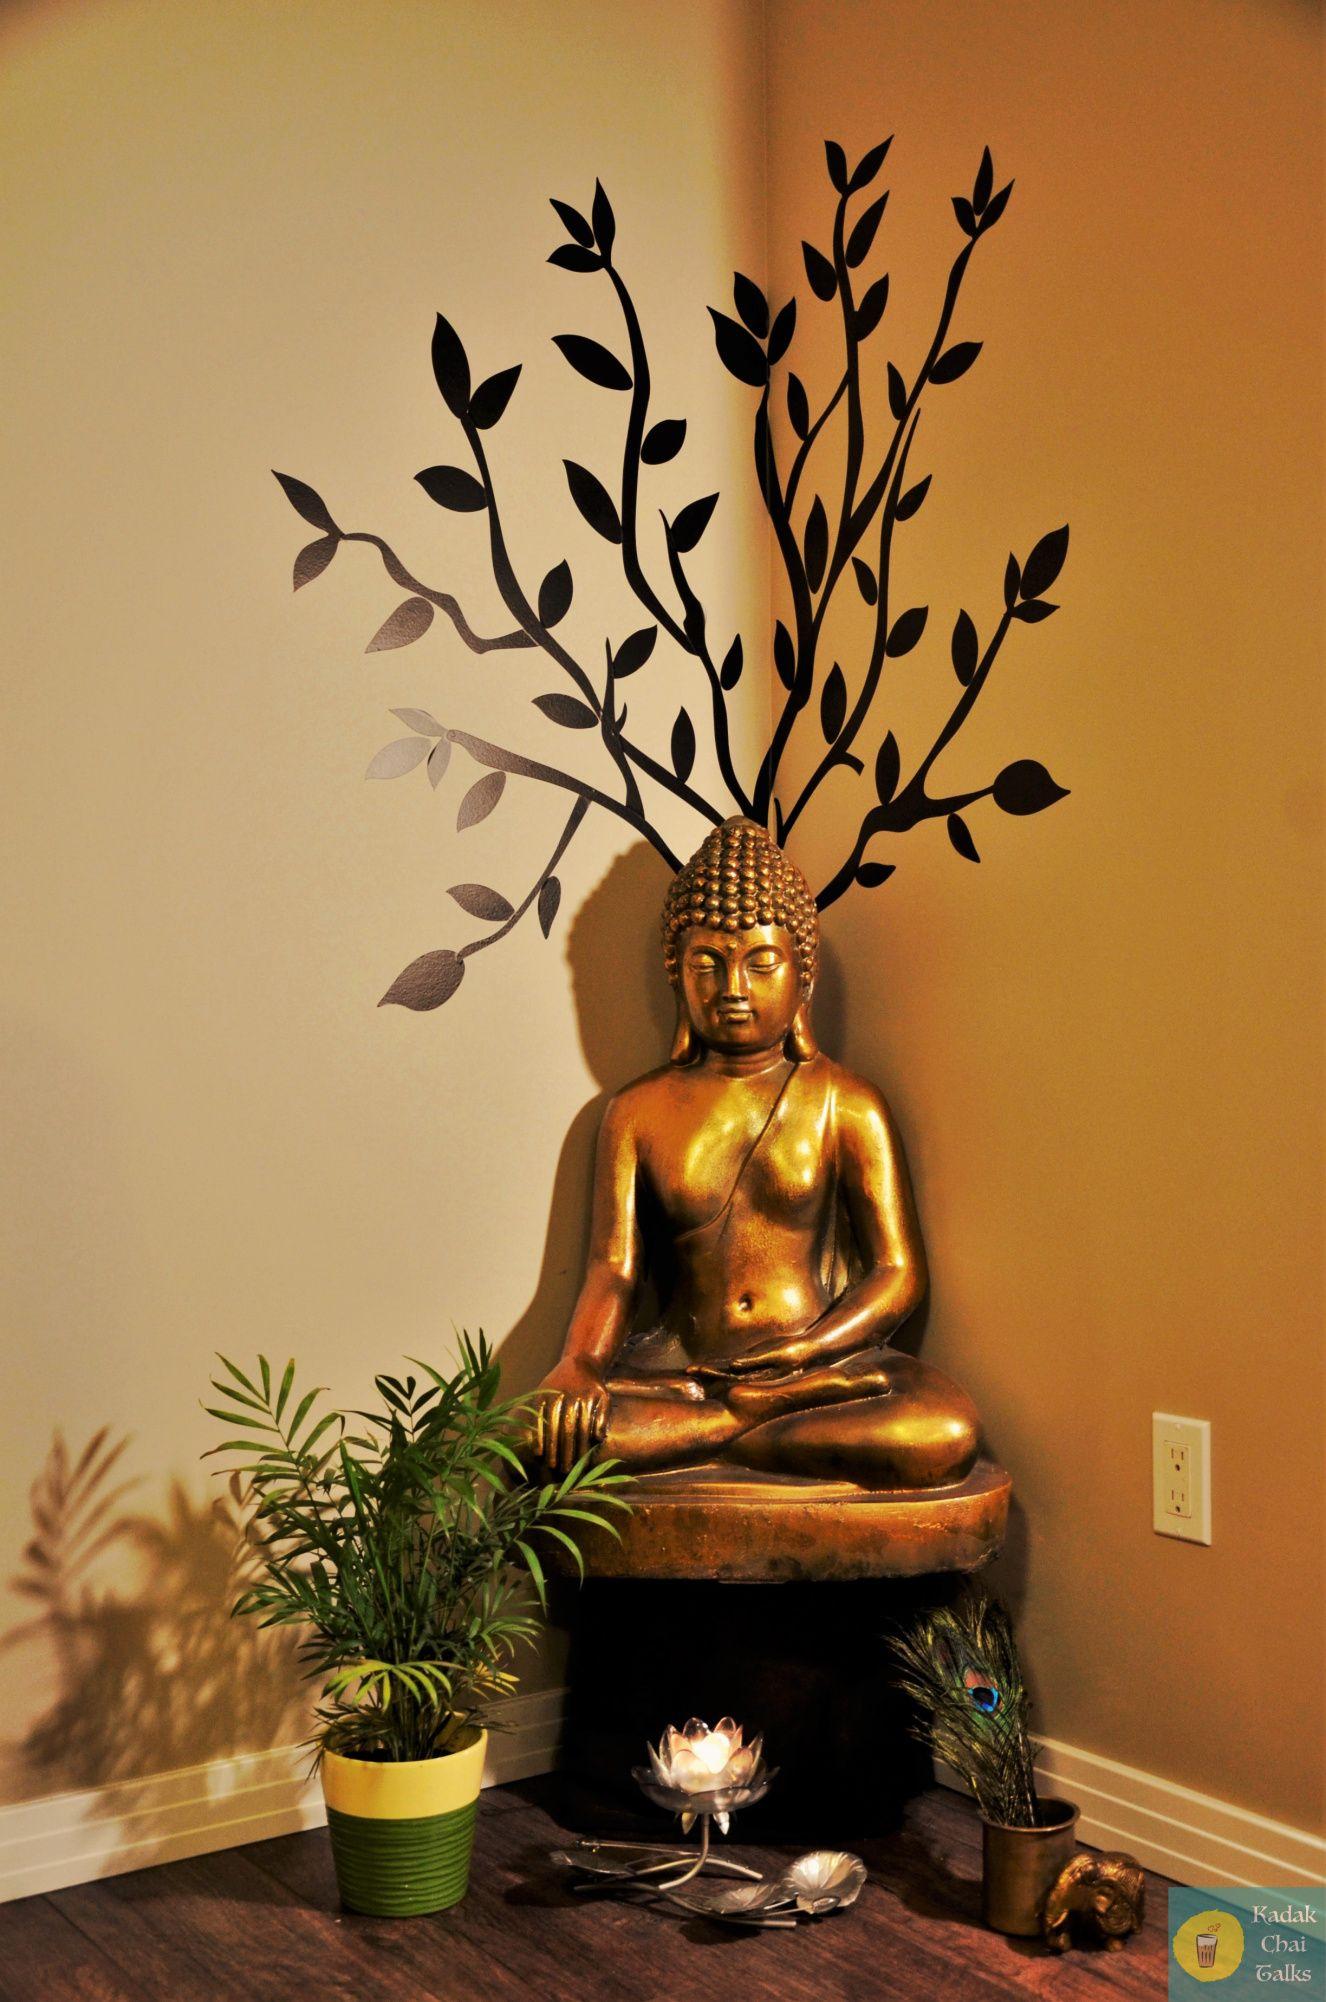 Mansion Foyer Quotes : Home tour of kadakchaitalks s shivangi naren featured